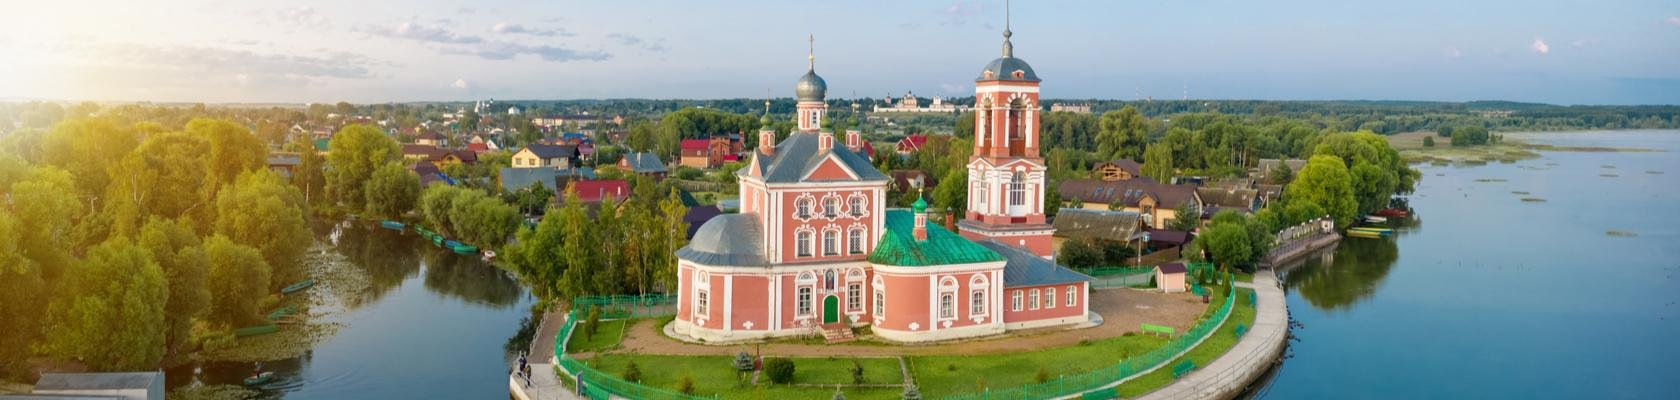 Pereslavl